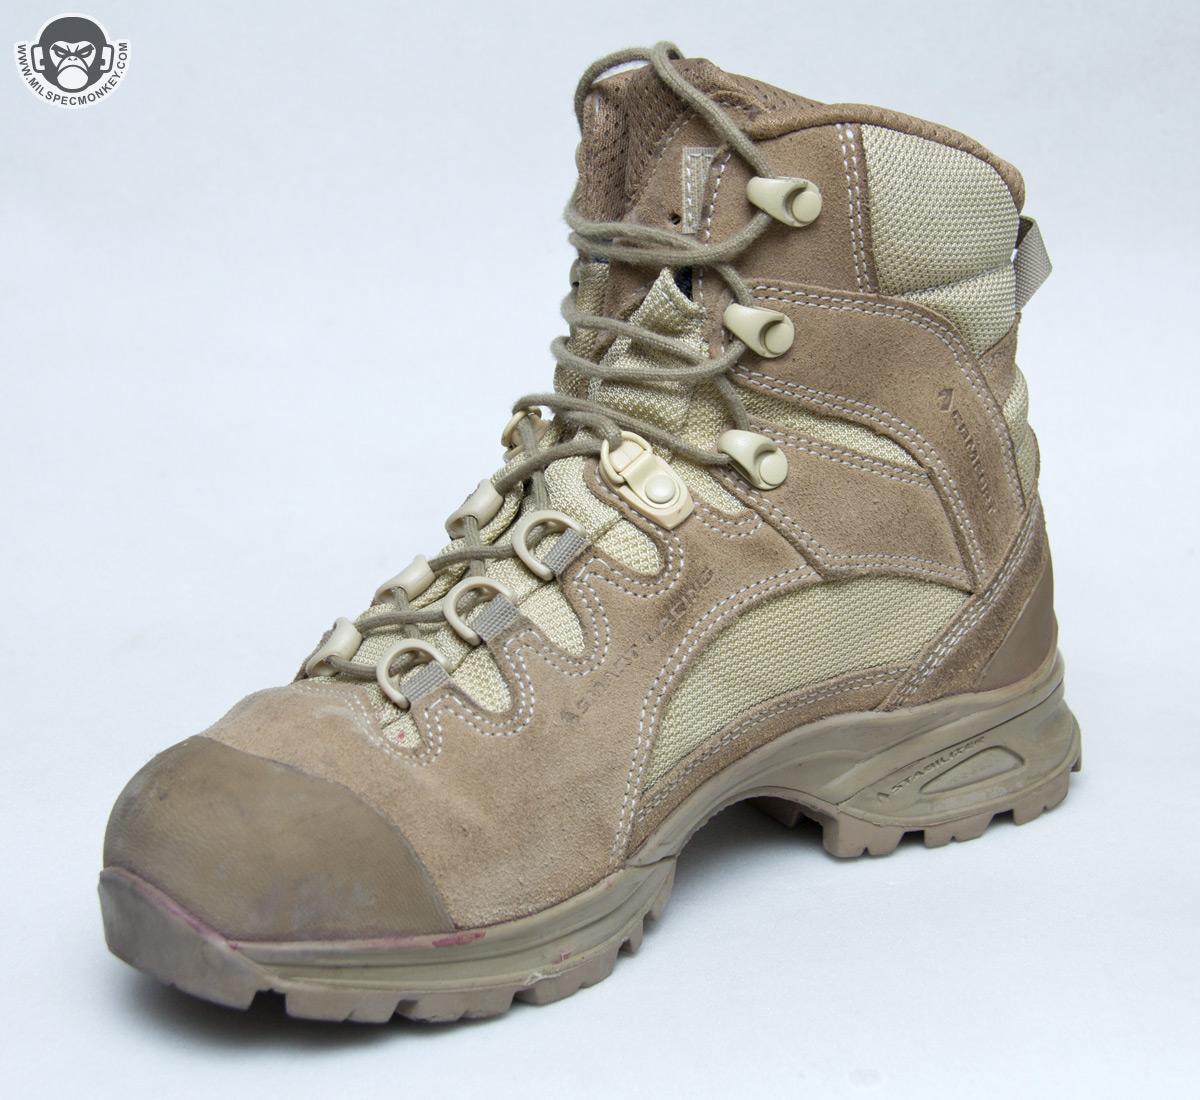 haix mission boot